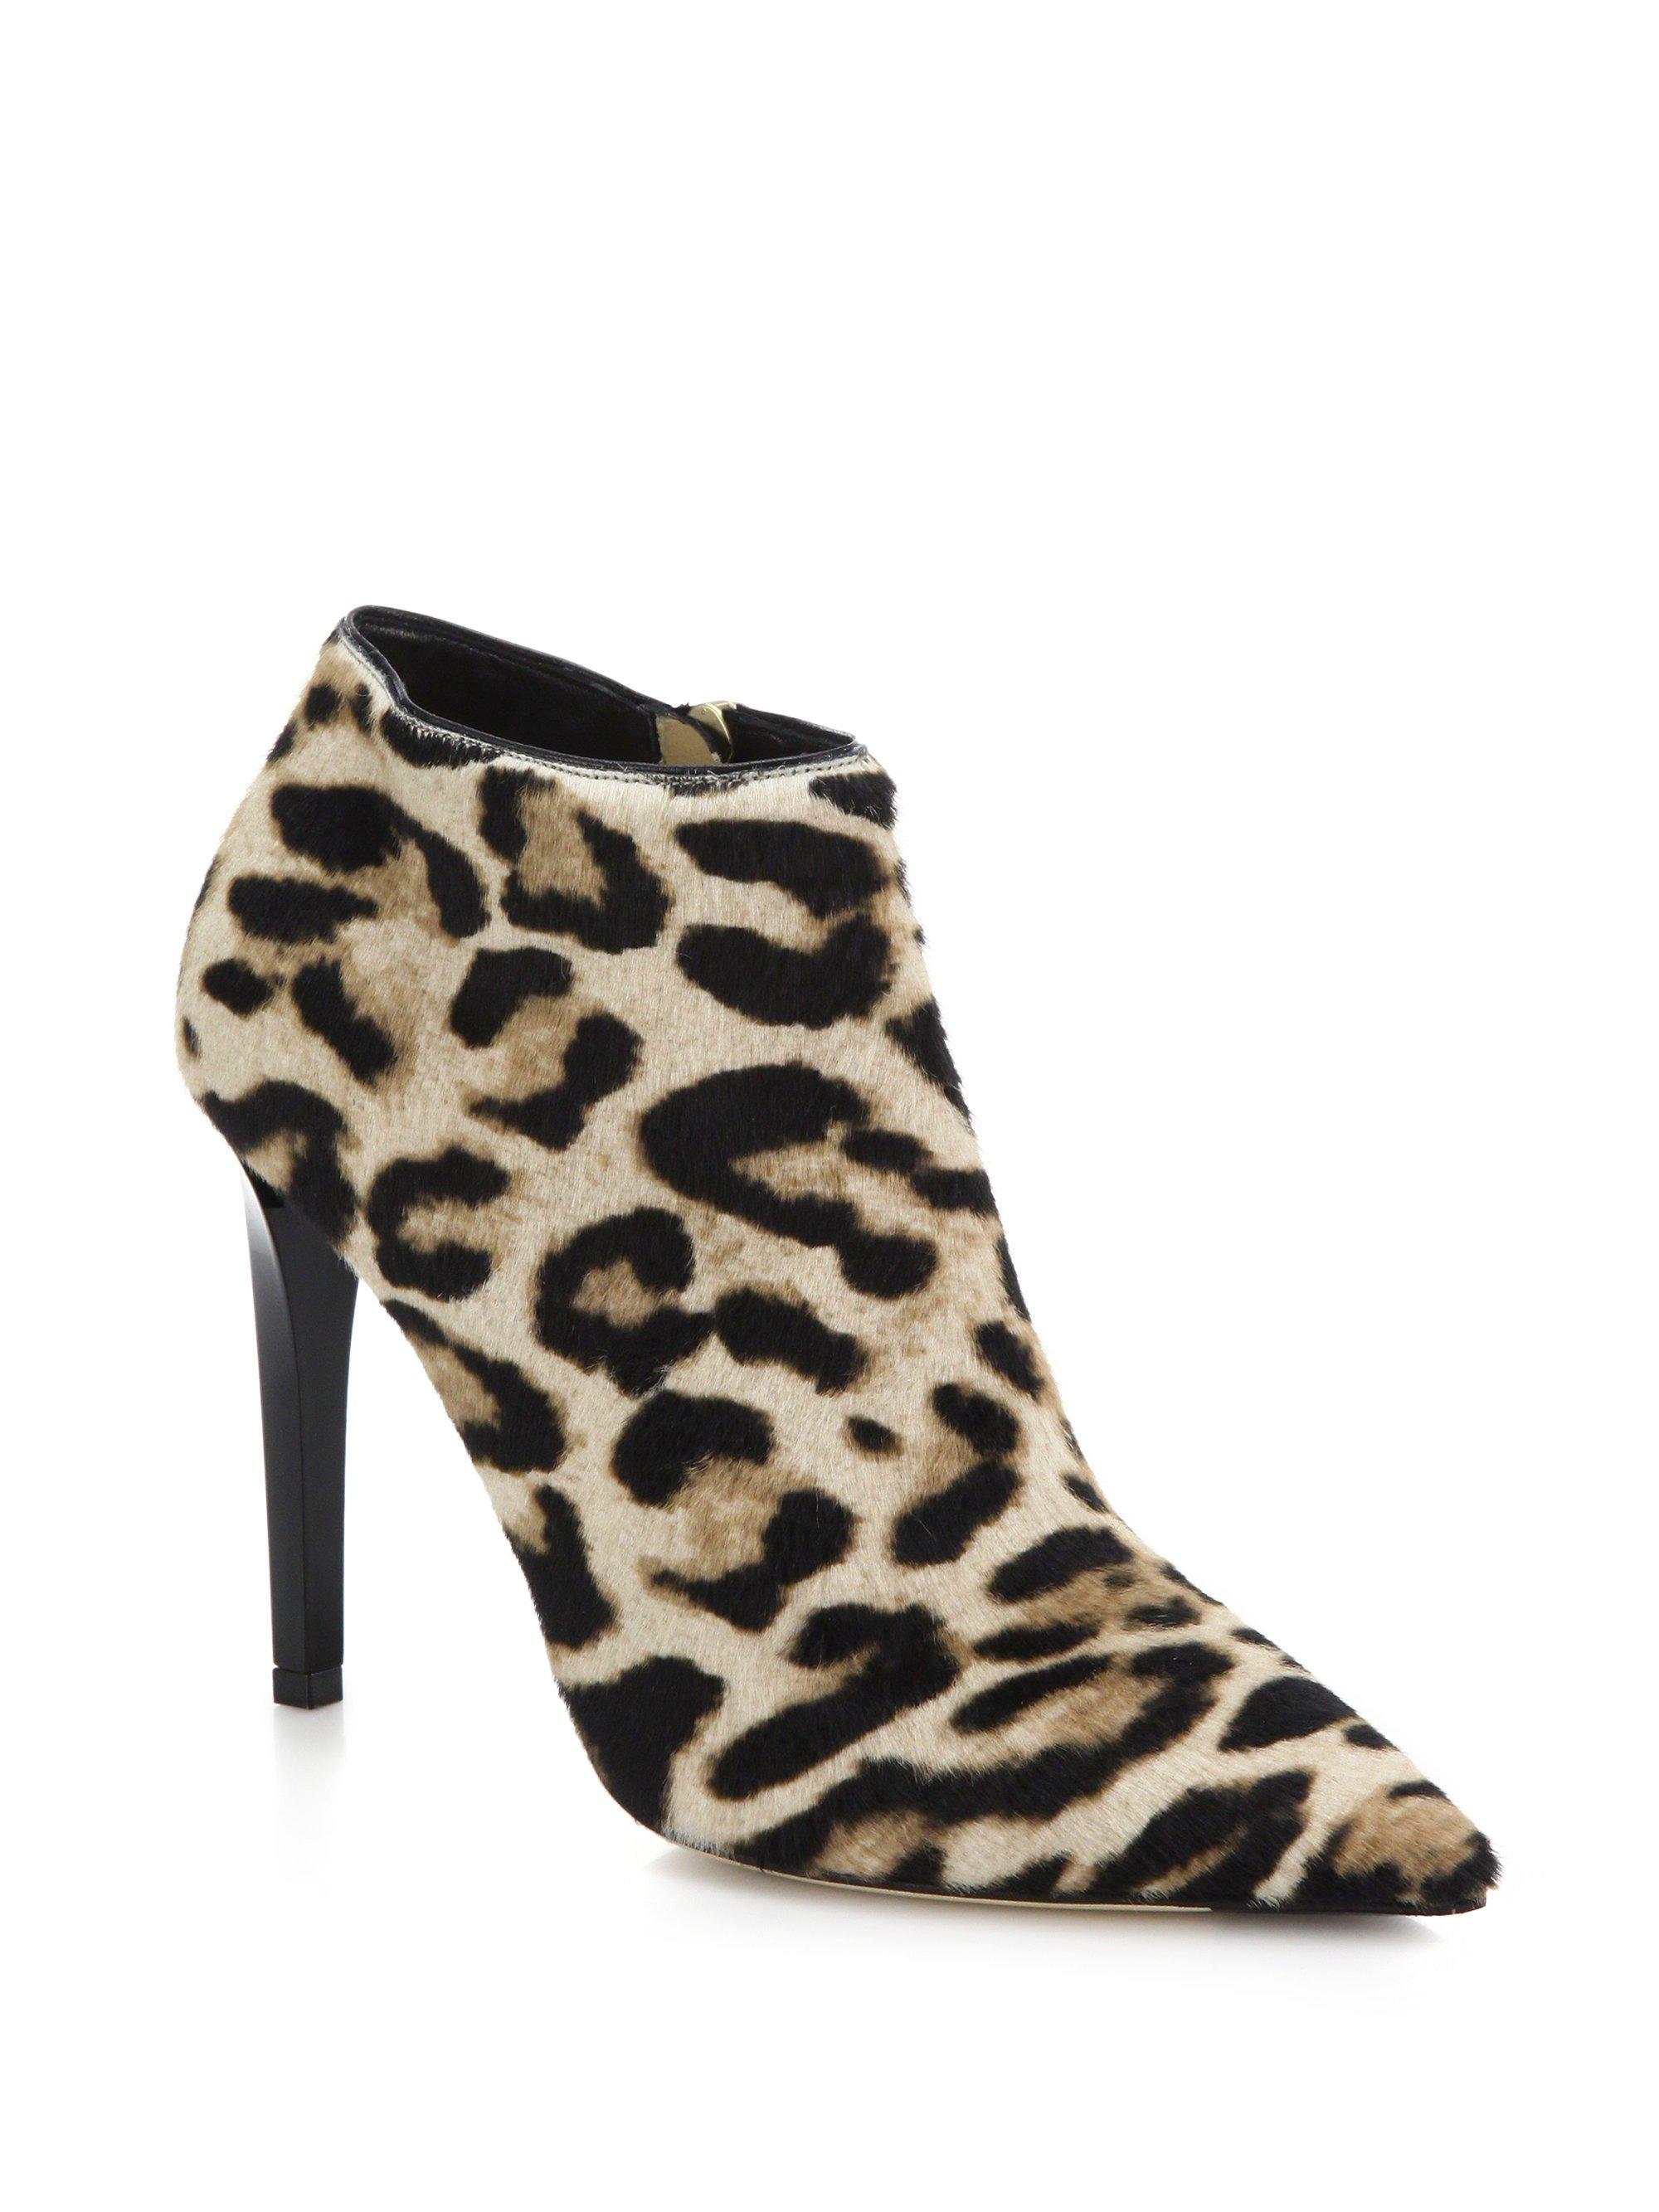 9c309e56be77 ... sale lyst jimmy choo liesl leopard print calf hair booties in natural  76909 58b19